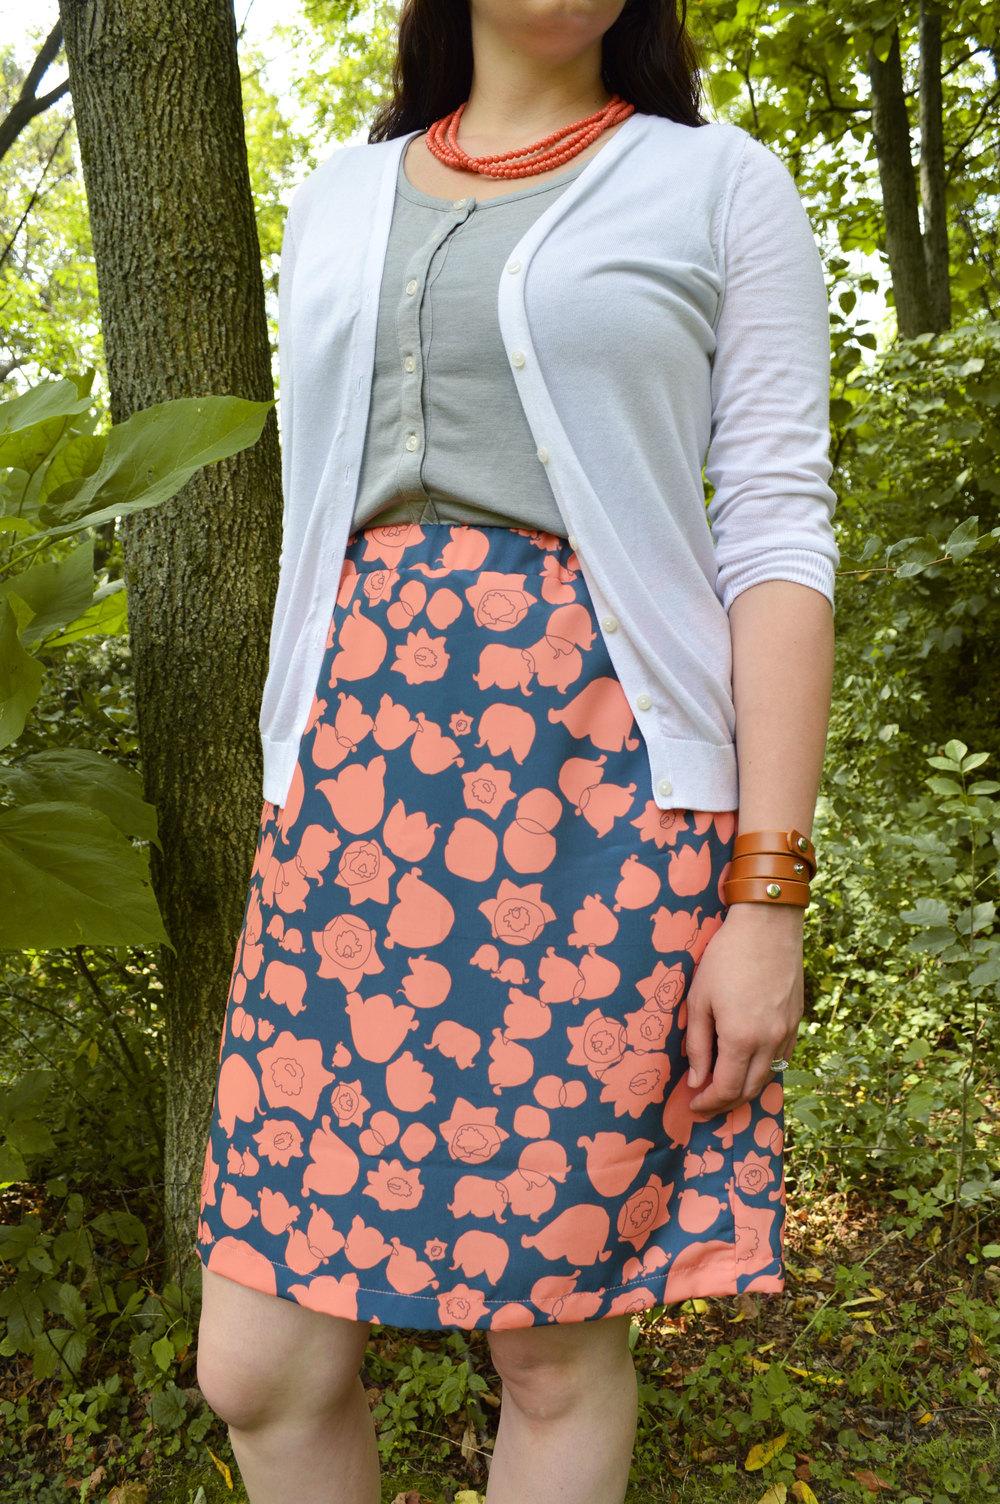 LOTV Sprawl Skirt